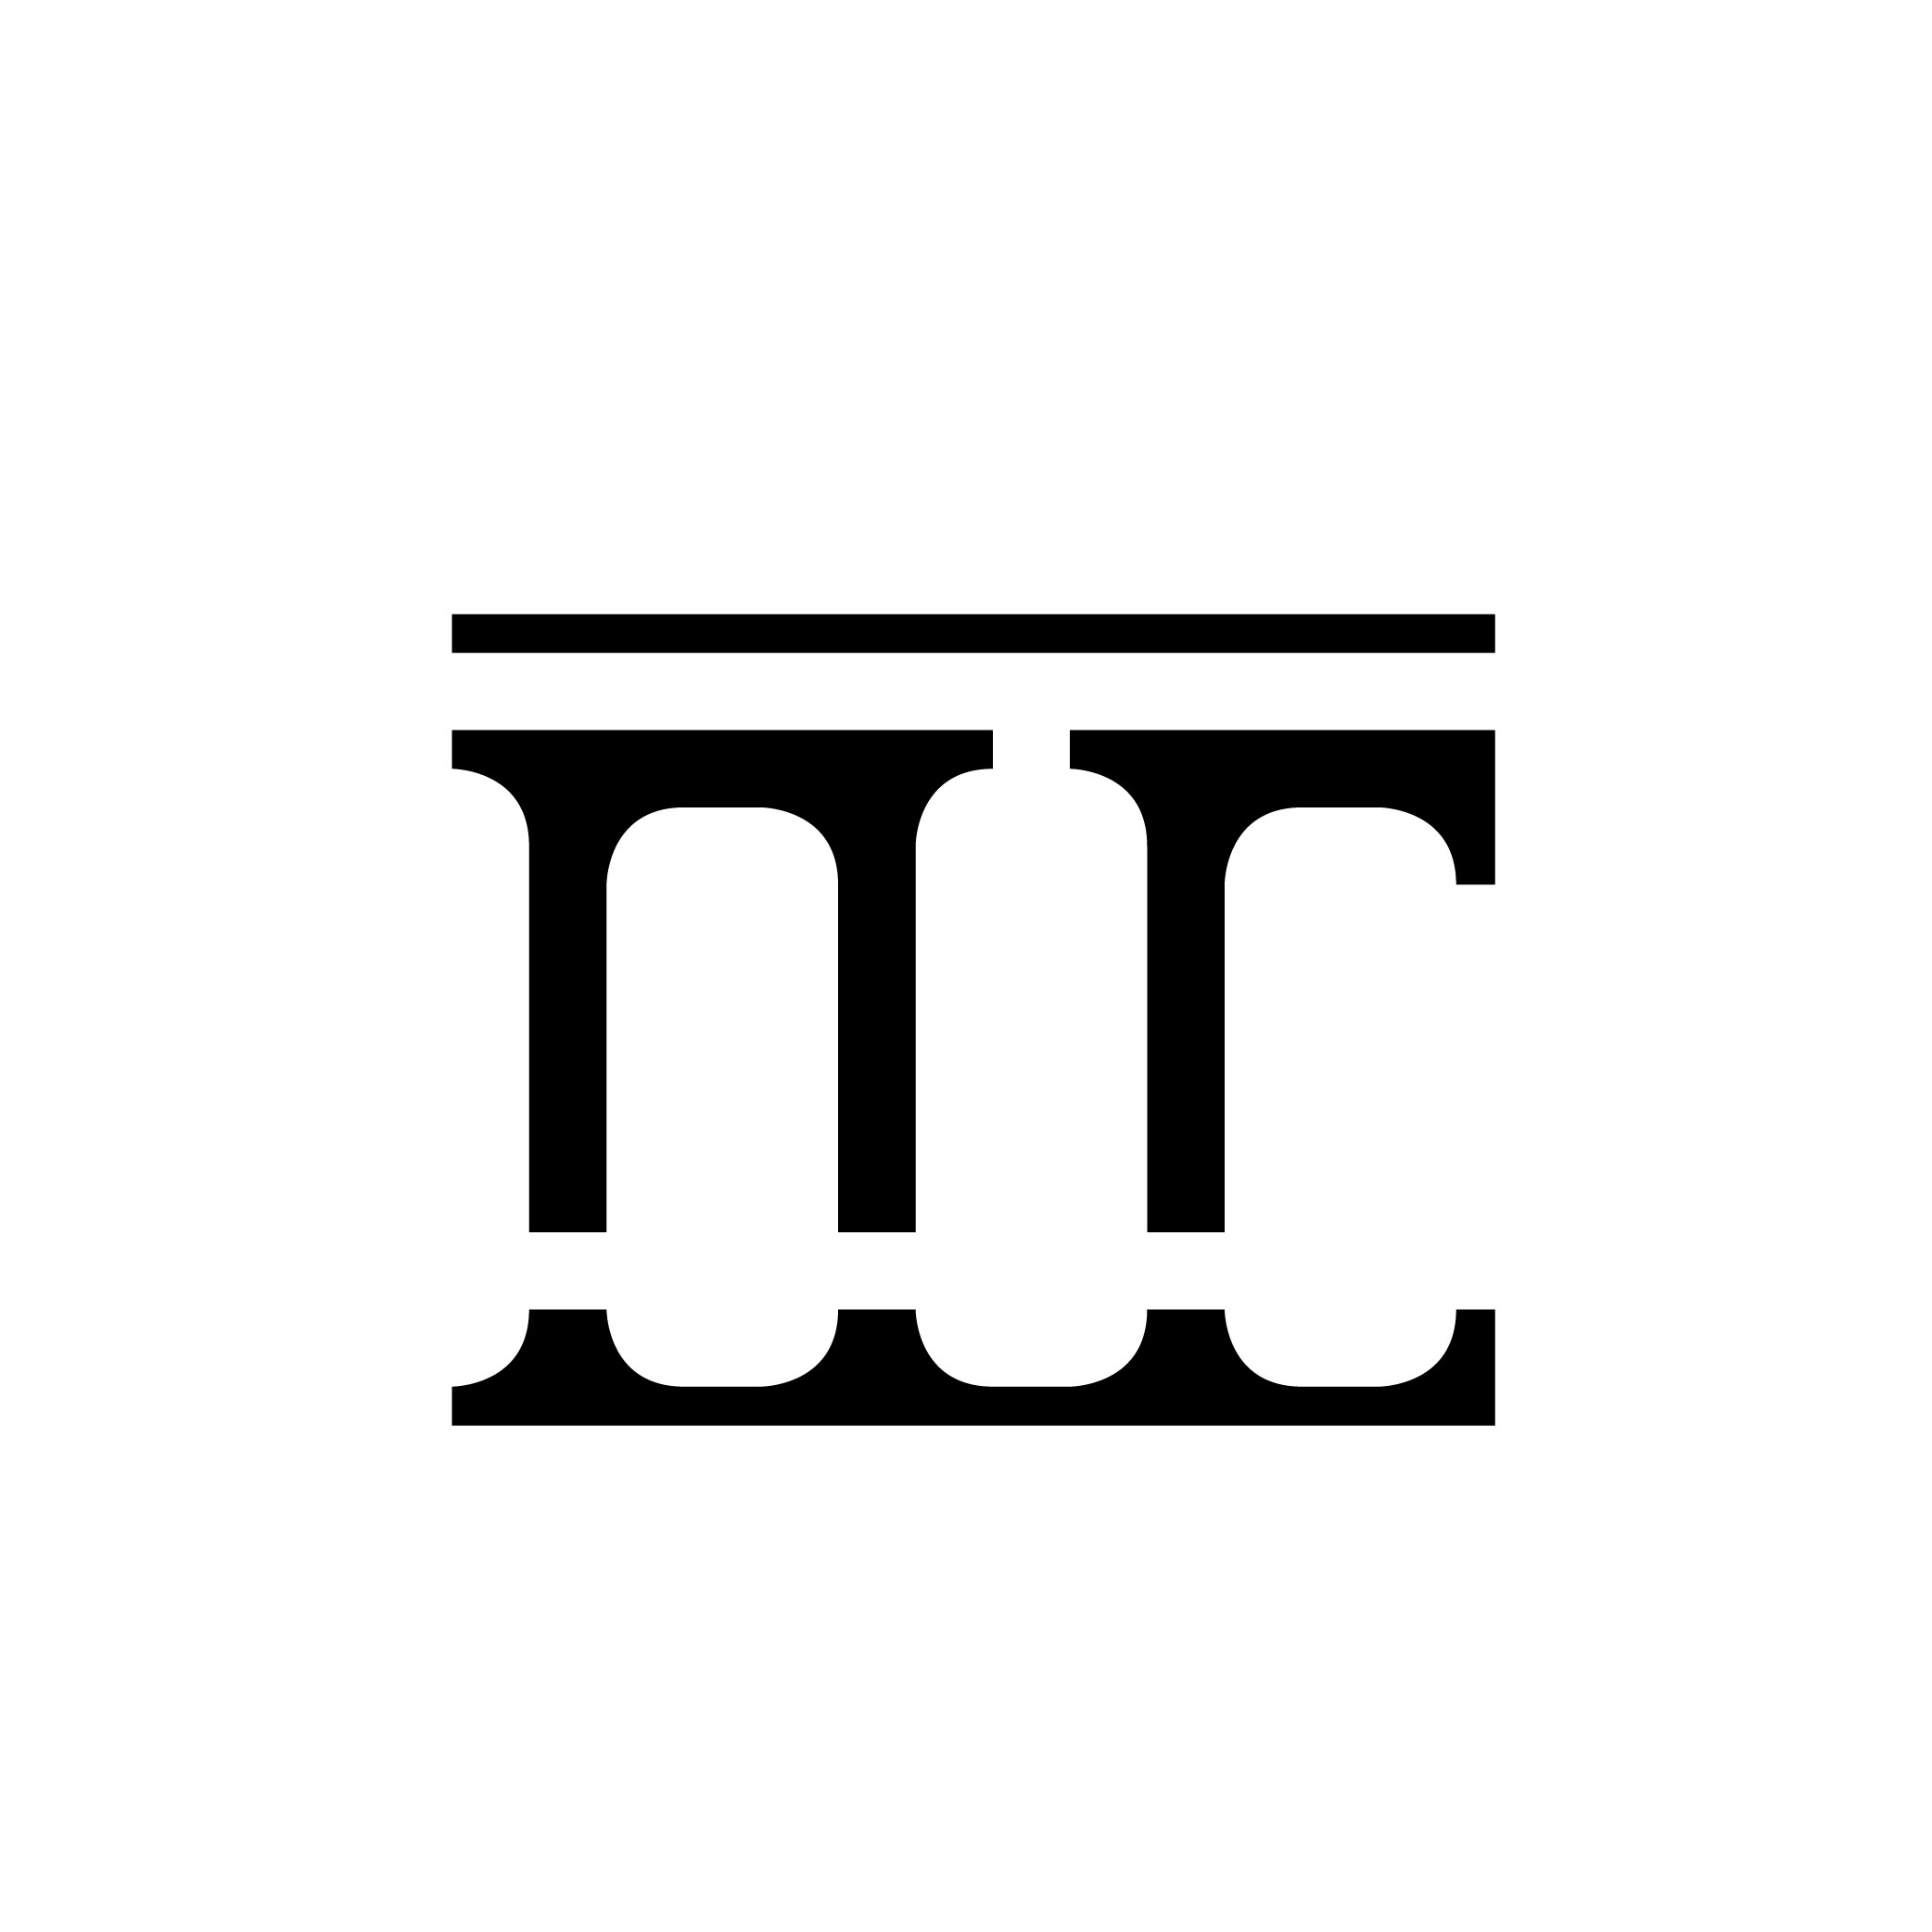 Логотип для Крафтовой Пивоварни фото f_8445cb02cadcdebe.jpg